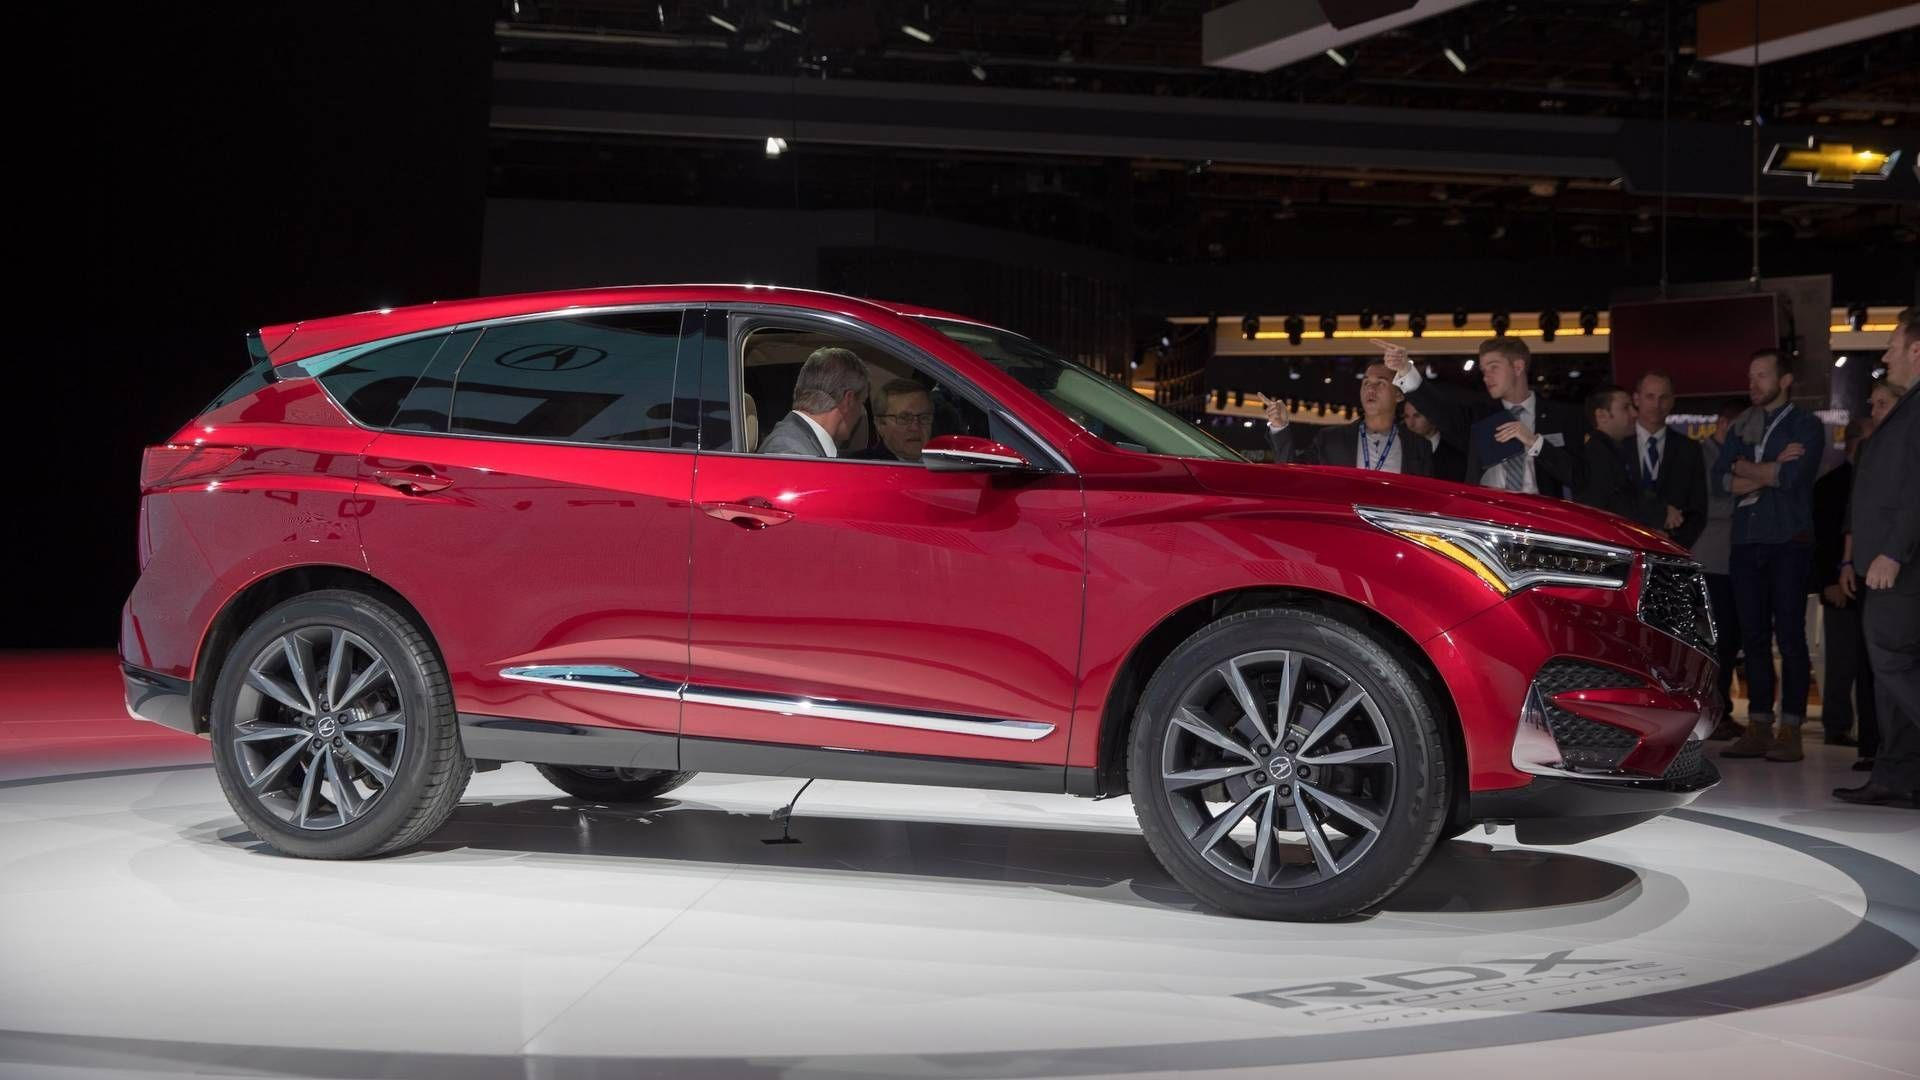 Best 2019 Acura Rdx New Concept Car Price 2019 Acura Rdx Acura Acura Mdx